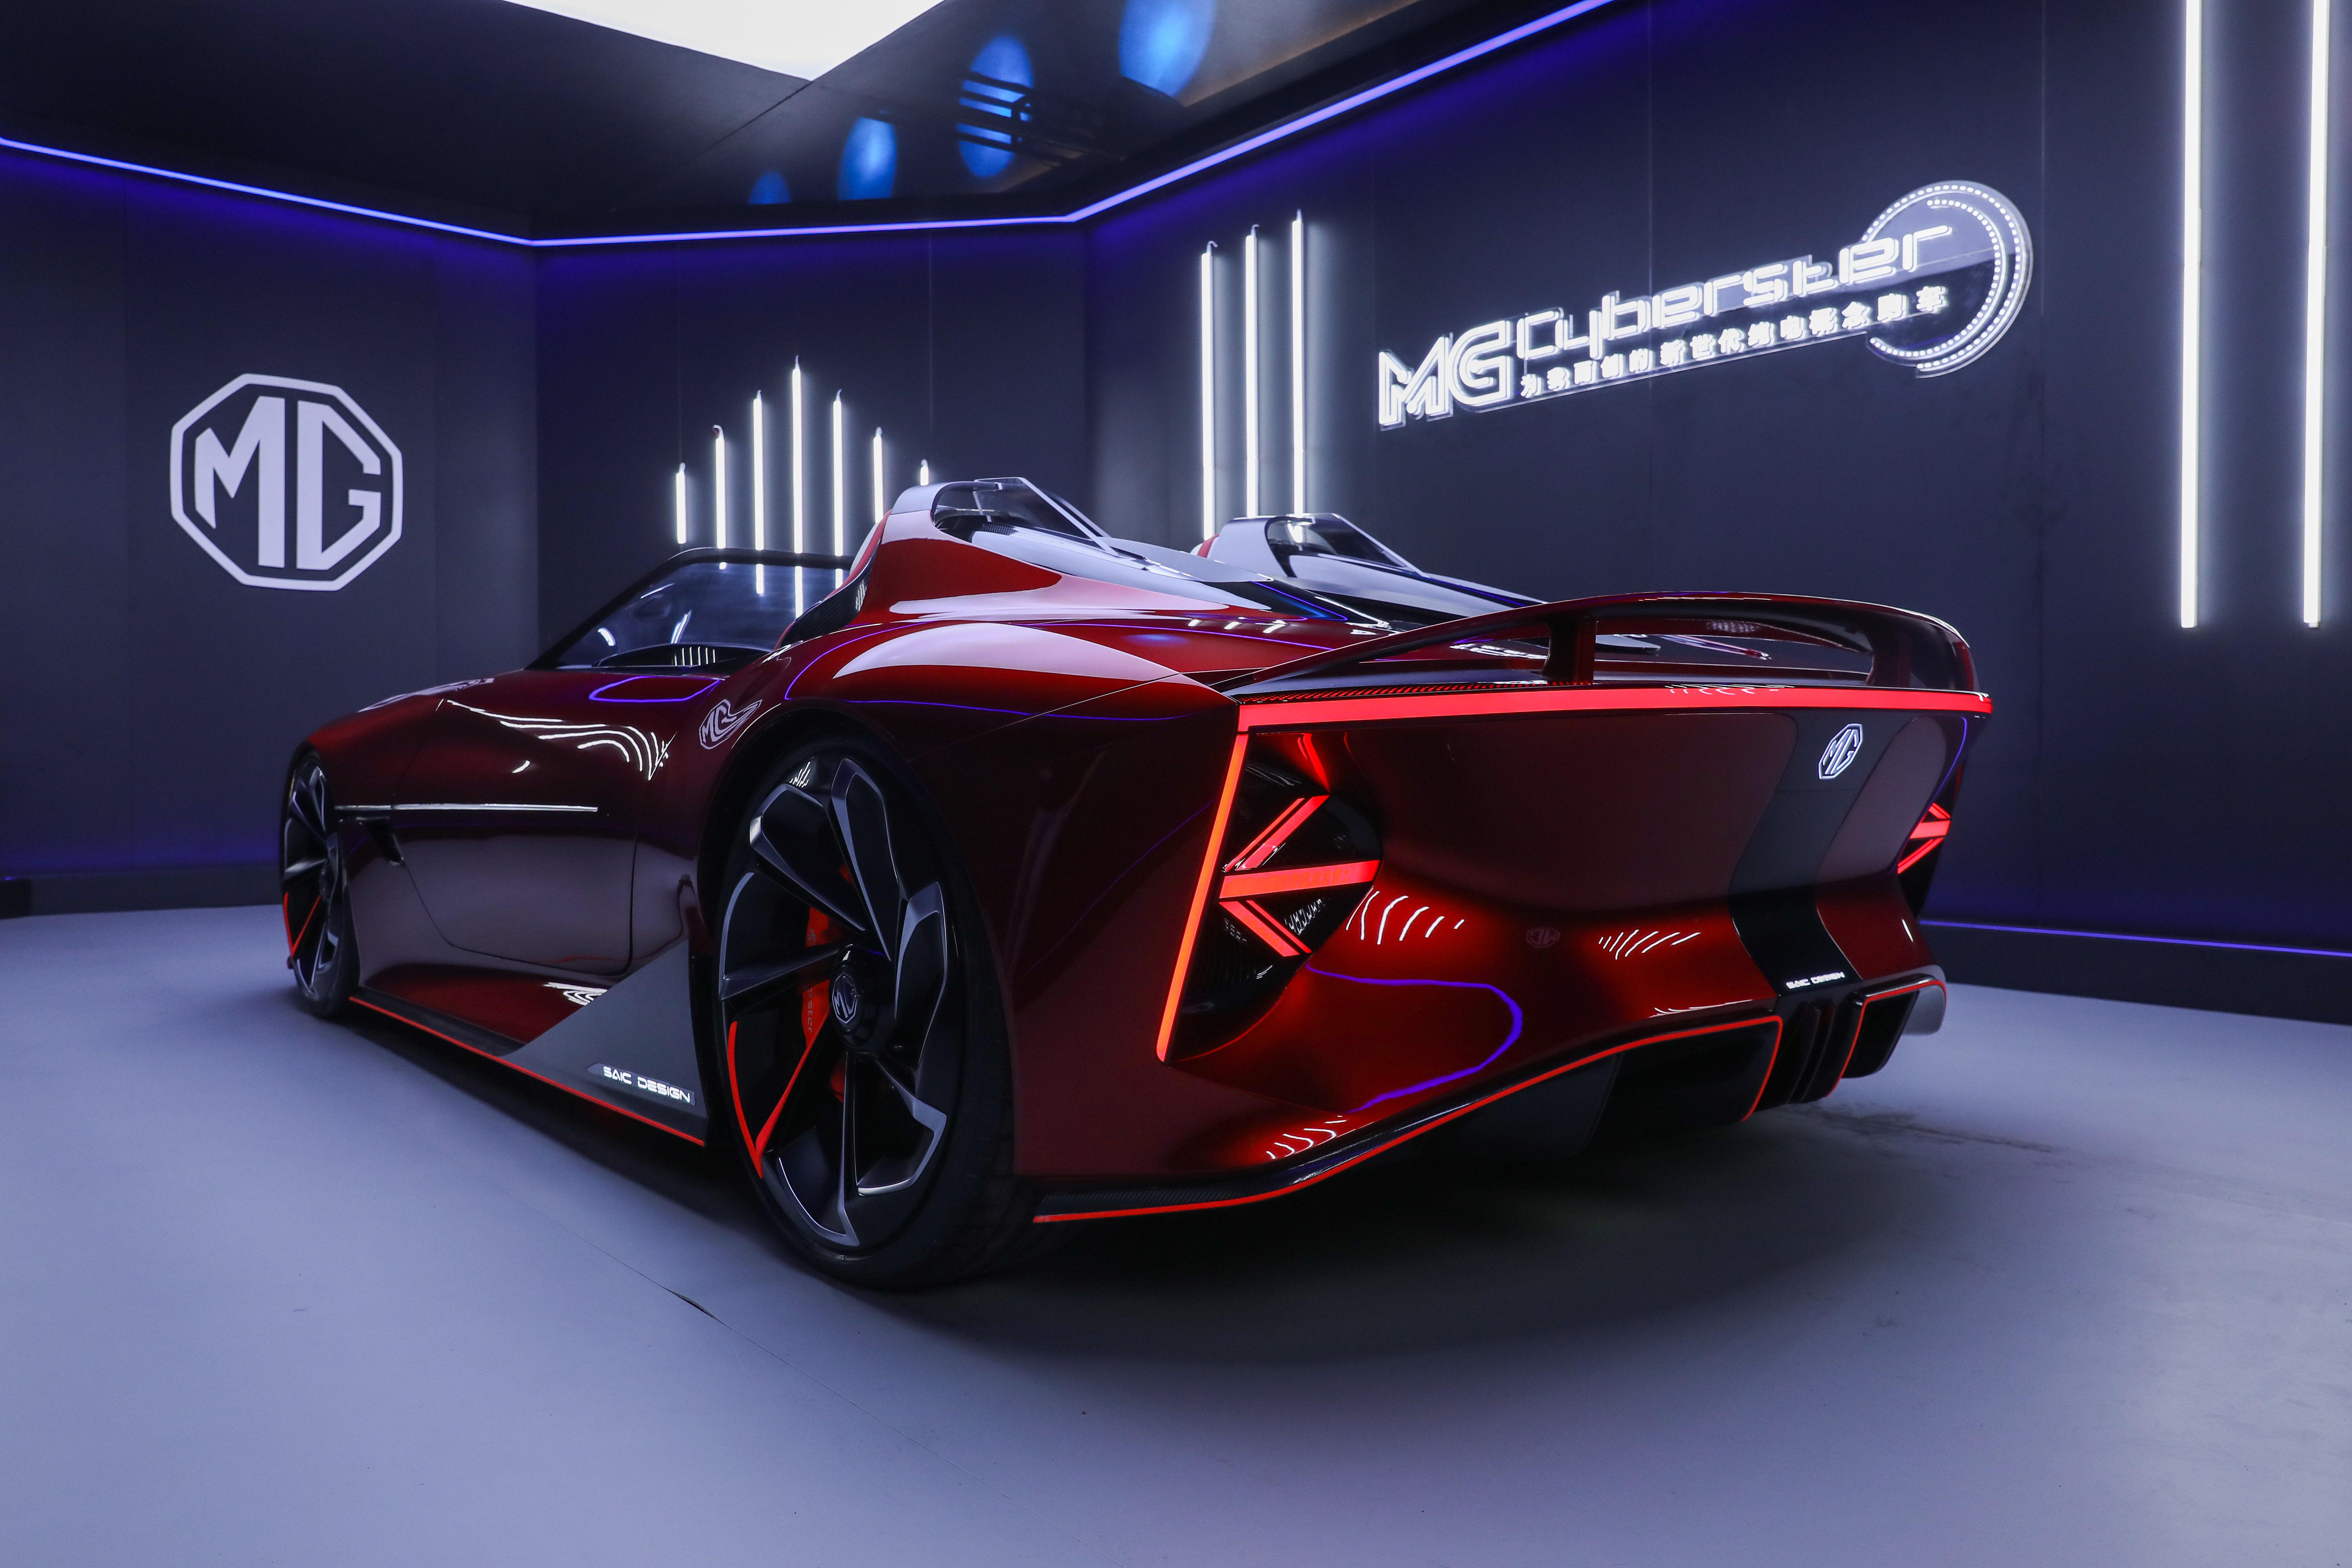 2021 mg cyberster concept rear 4k 1620170764 - 2021 MG Cyberster Concept Rear 4k - 2021 MG Cyberster Concept Rear 4k wallpapers